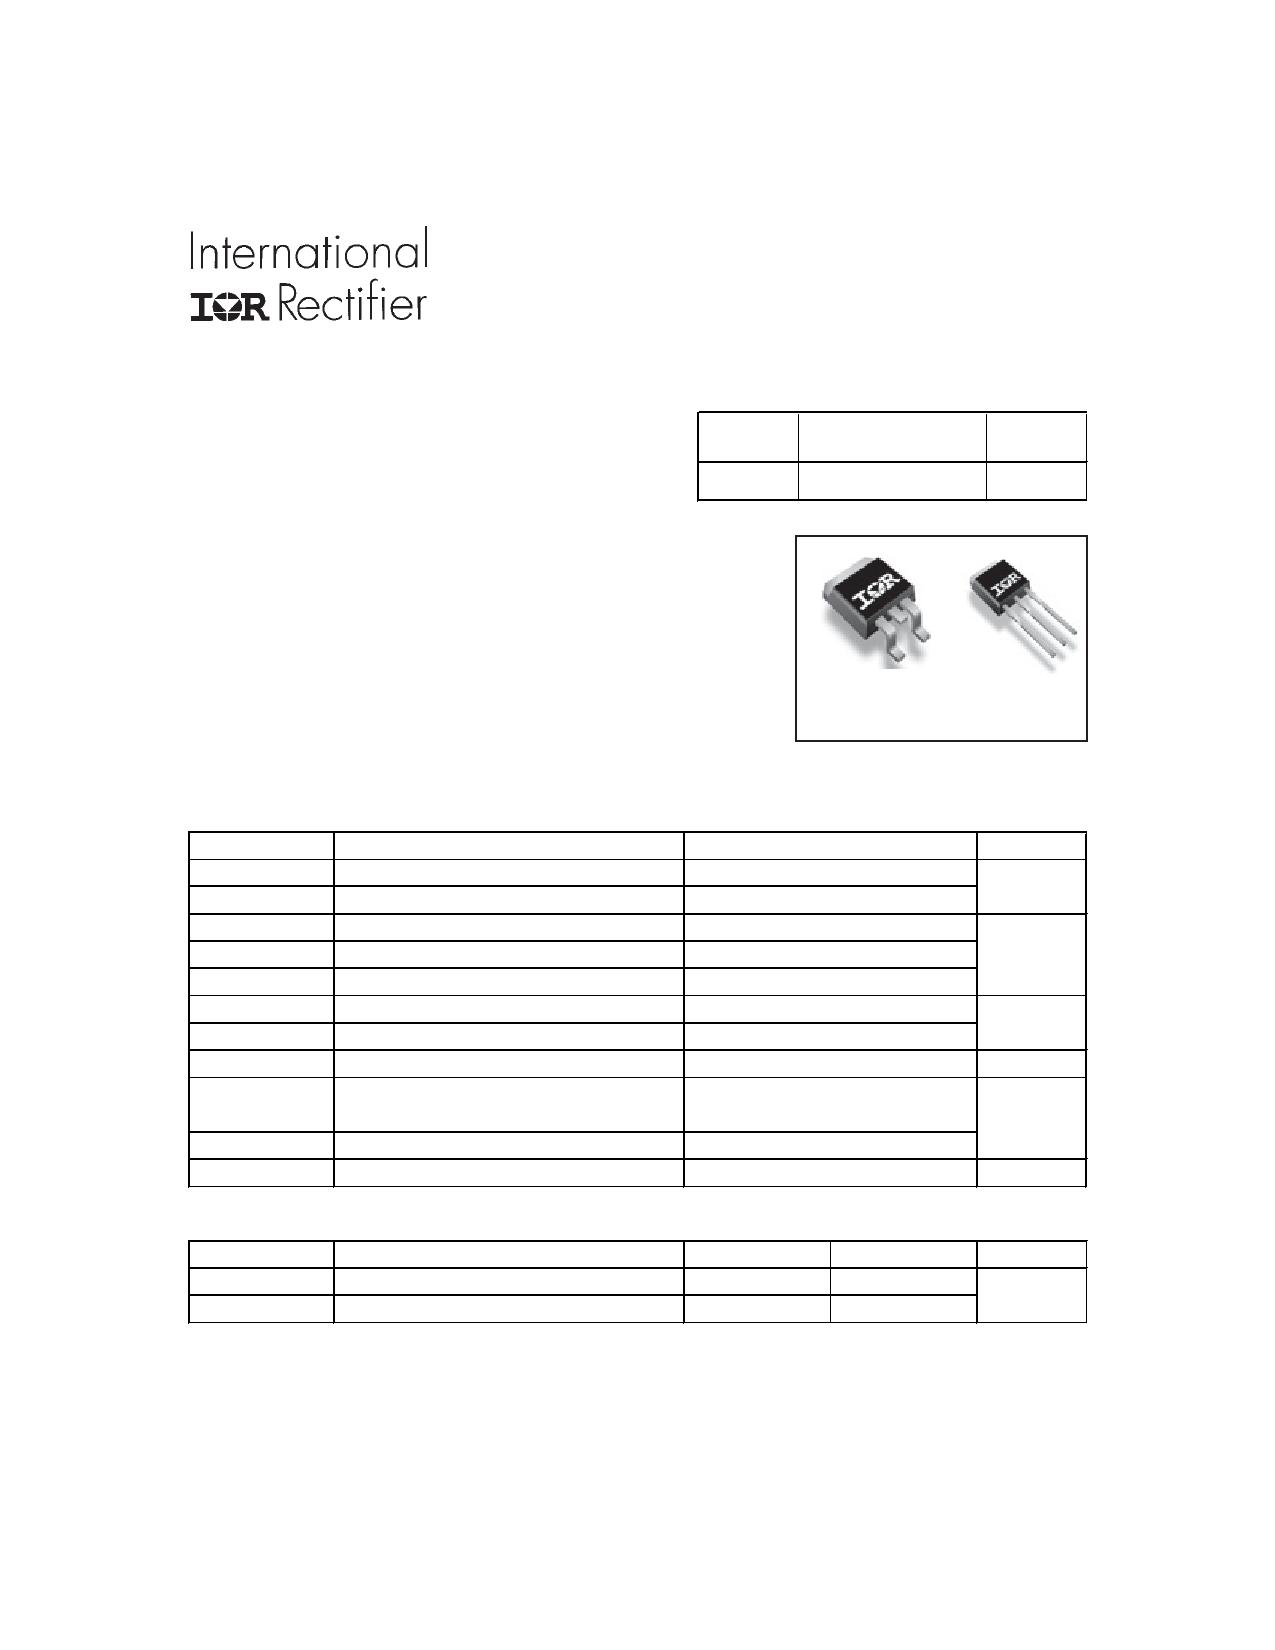 IRF3707ZCSPbF Datasheet, IRF3707ZCSPbF PDF,ピン配置, 機能